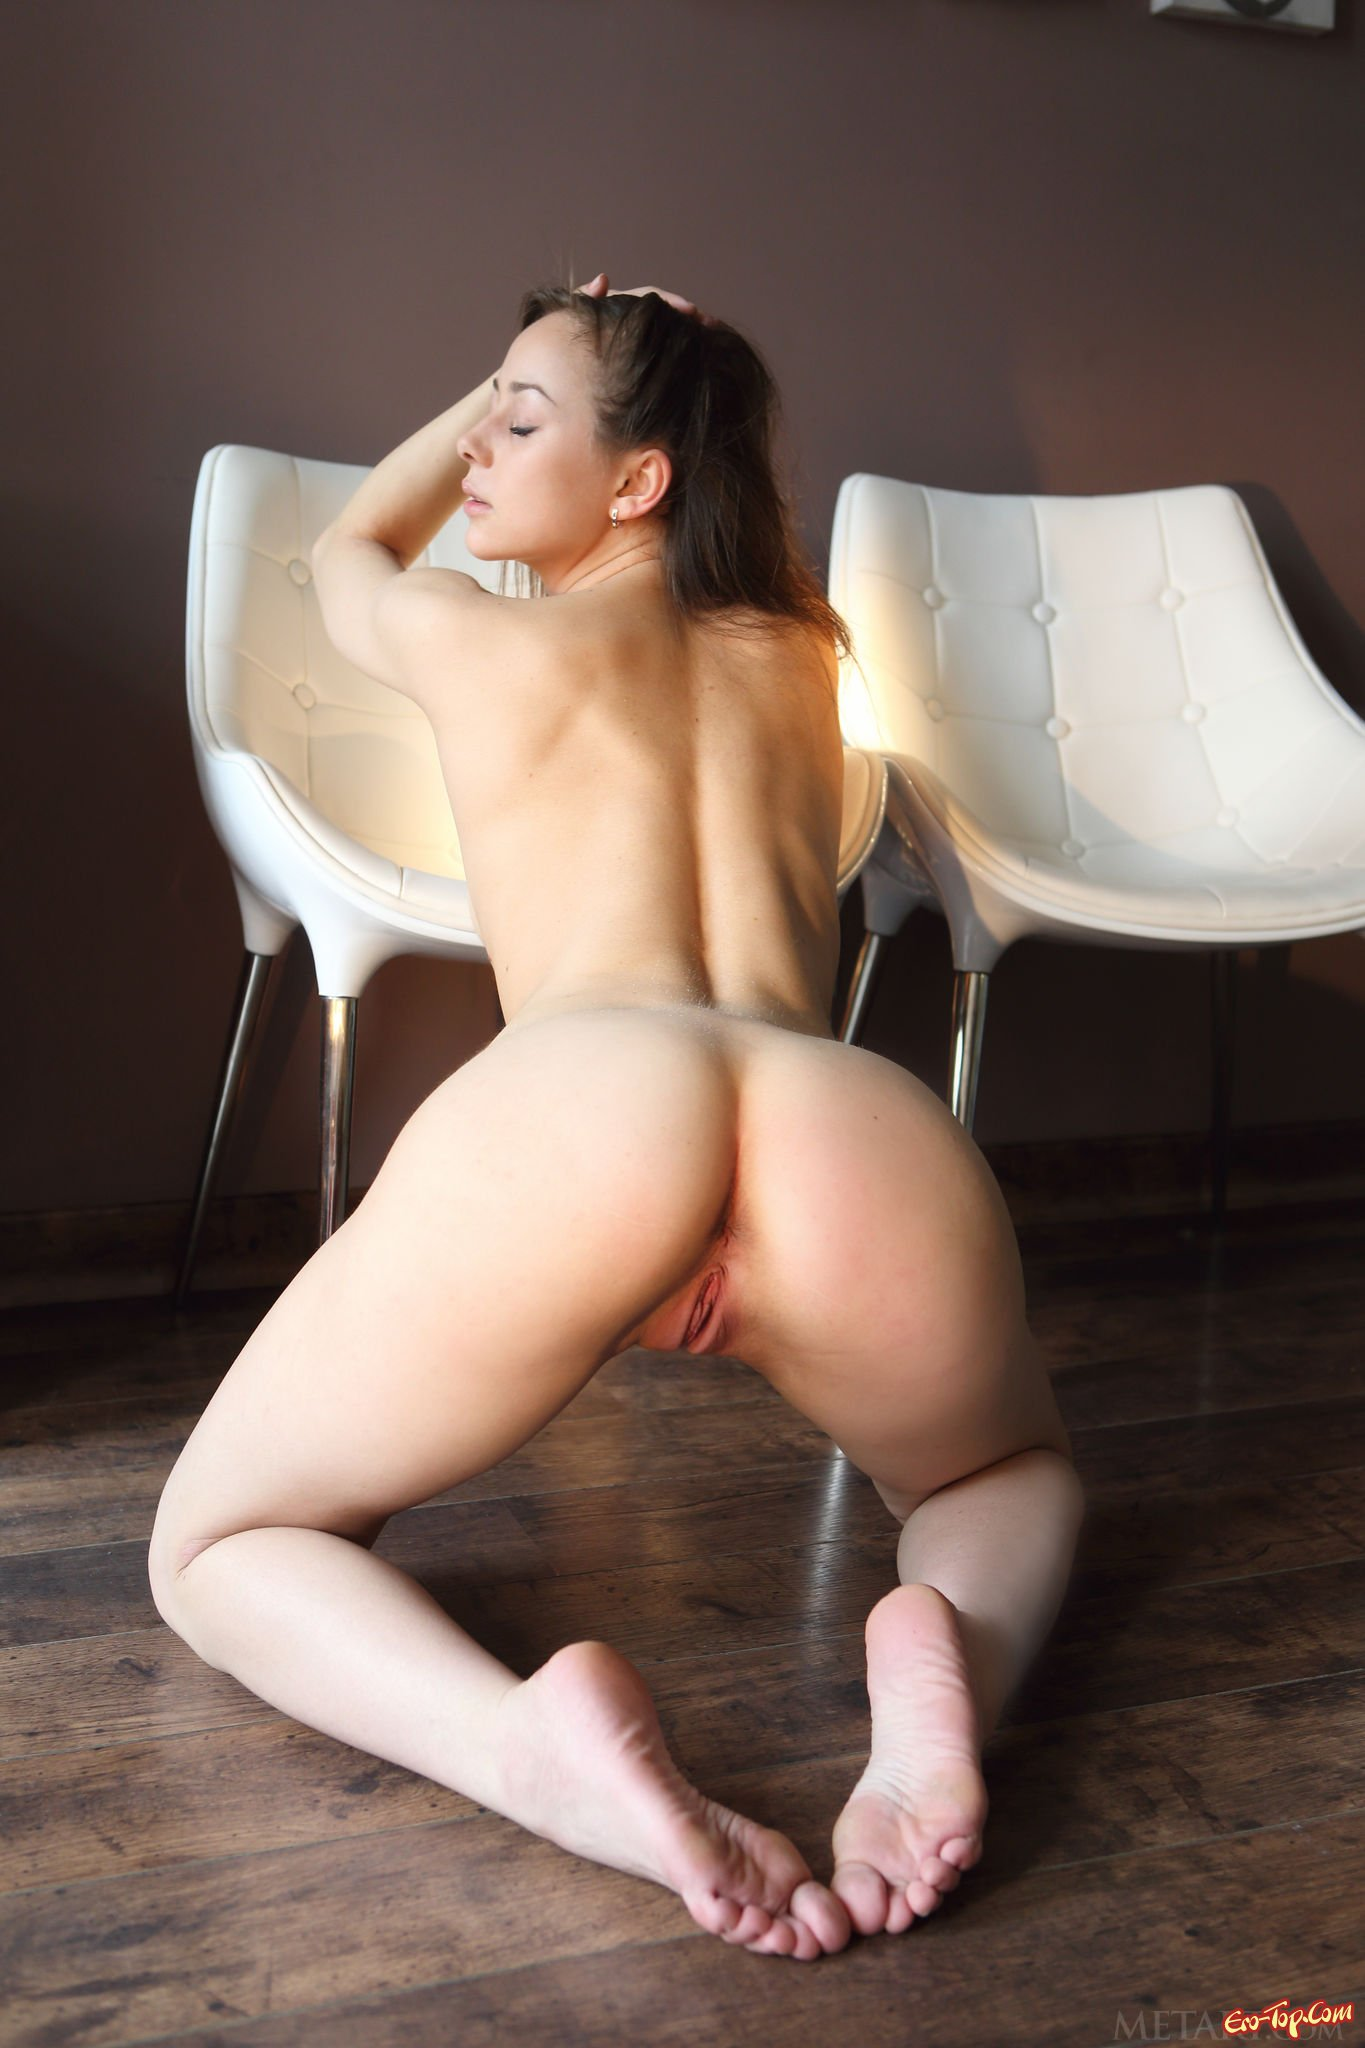 Small ass tumblr